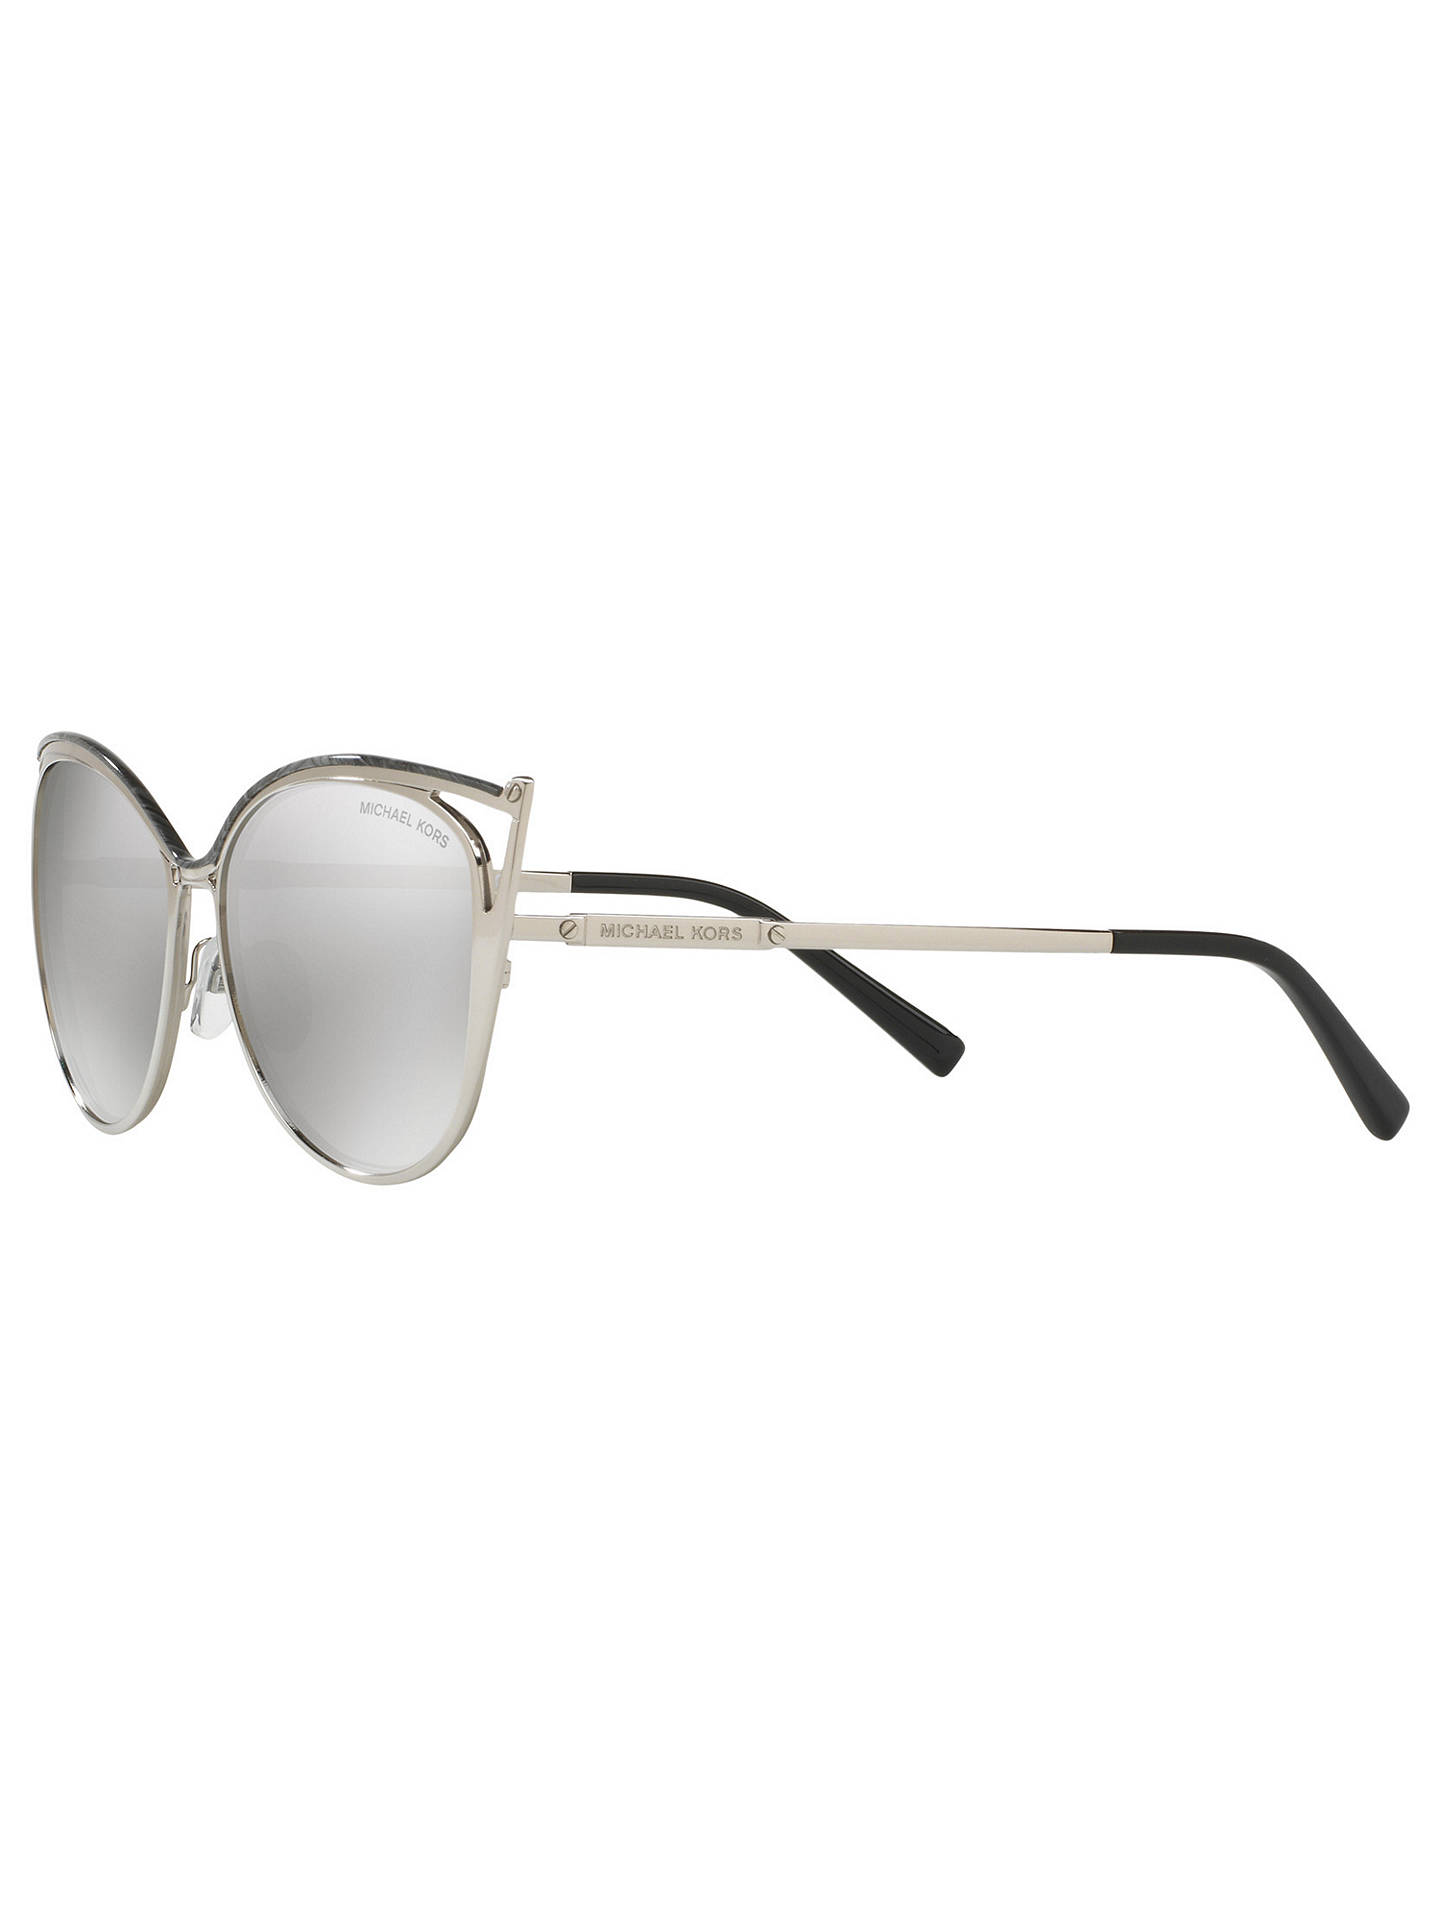 44d0ebd20b954 Michael Kors MK1020 Ina Cat s Eye Sunglasses at John Lewis   Partners